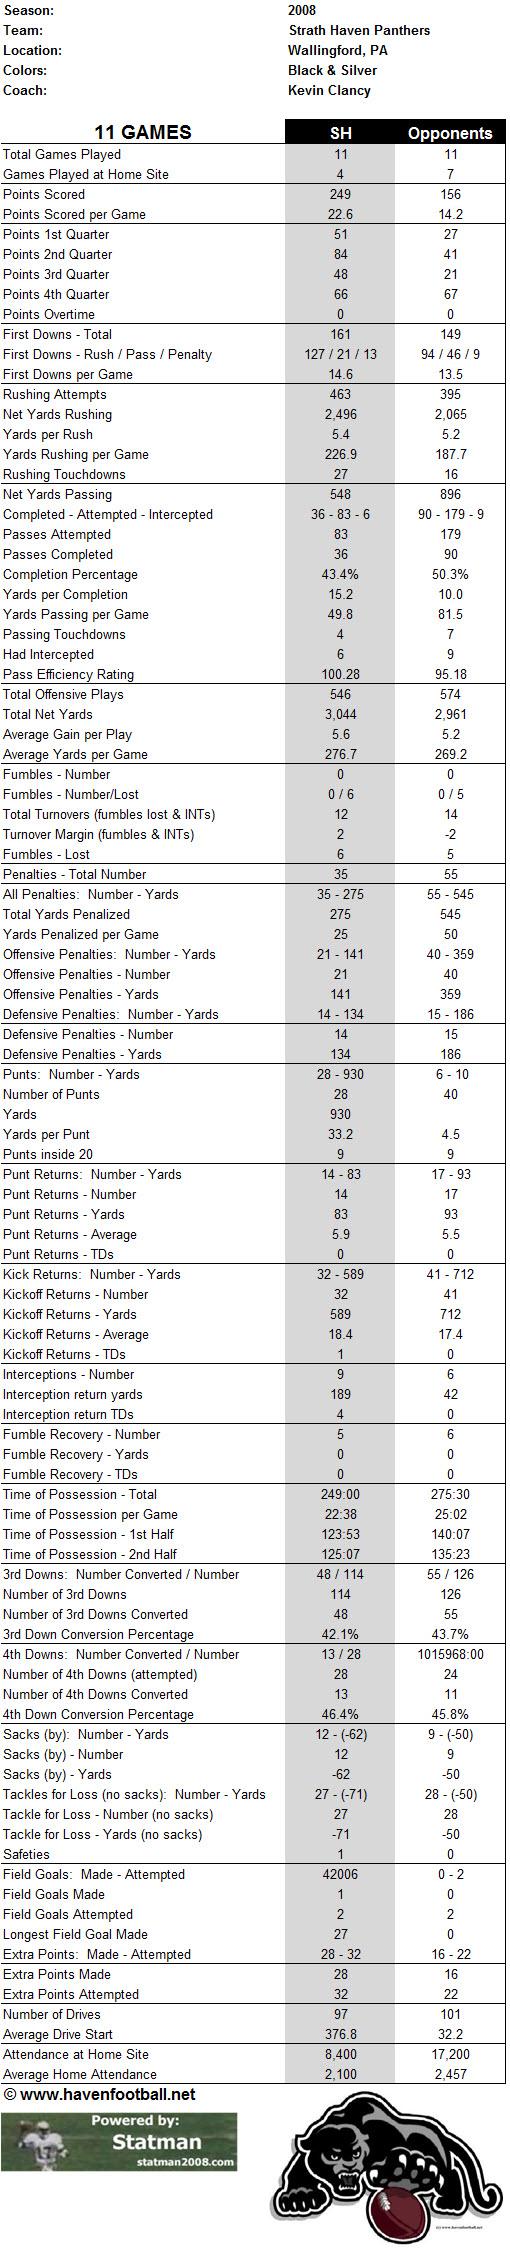 2008 Season Game Stats